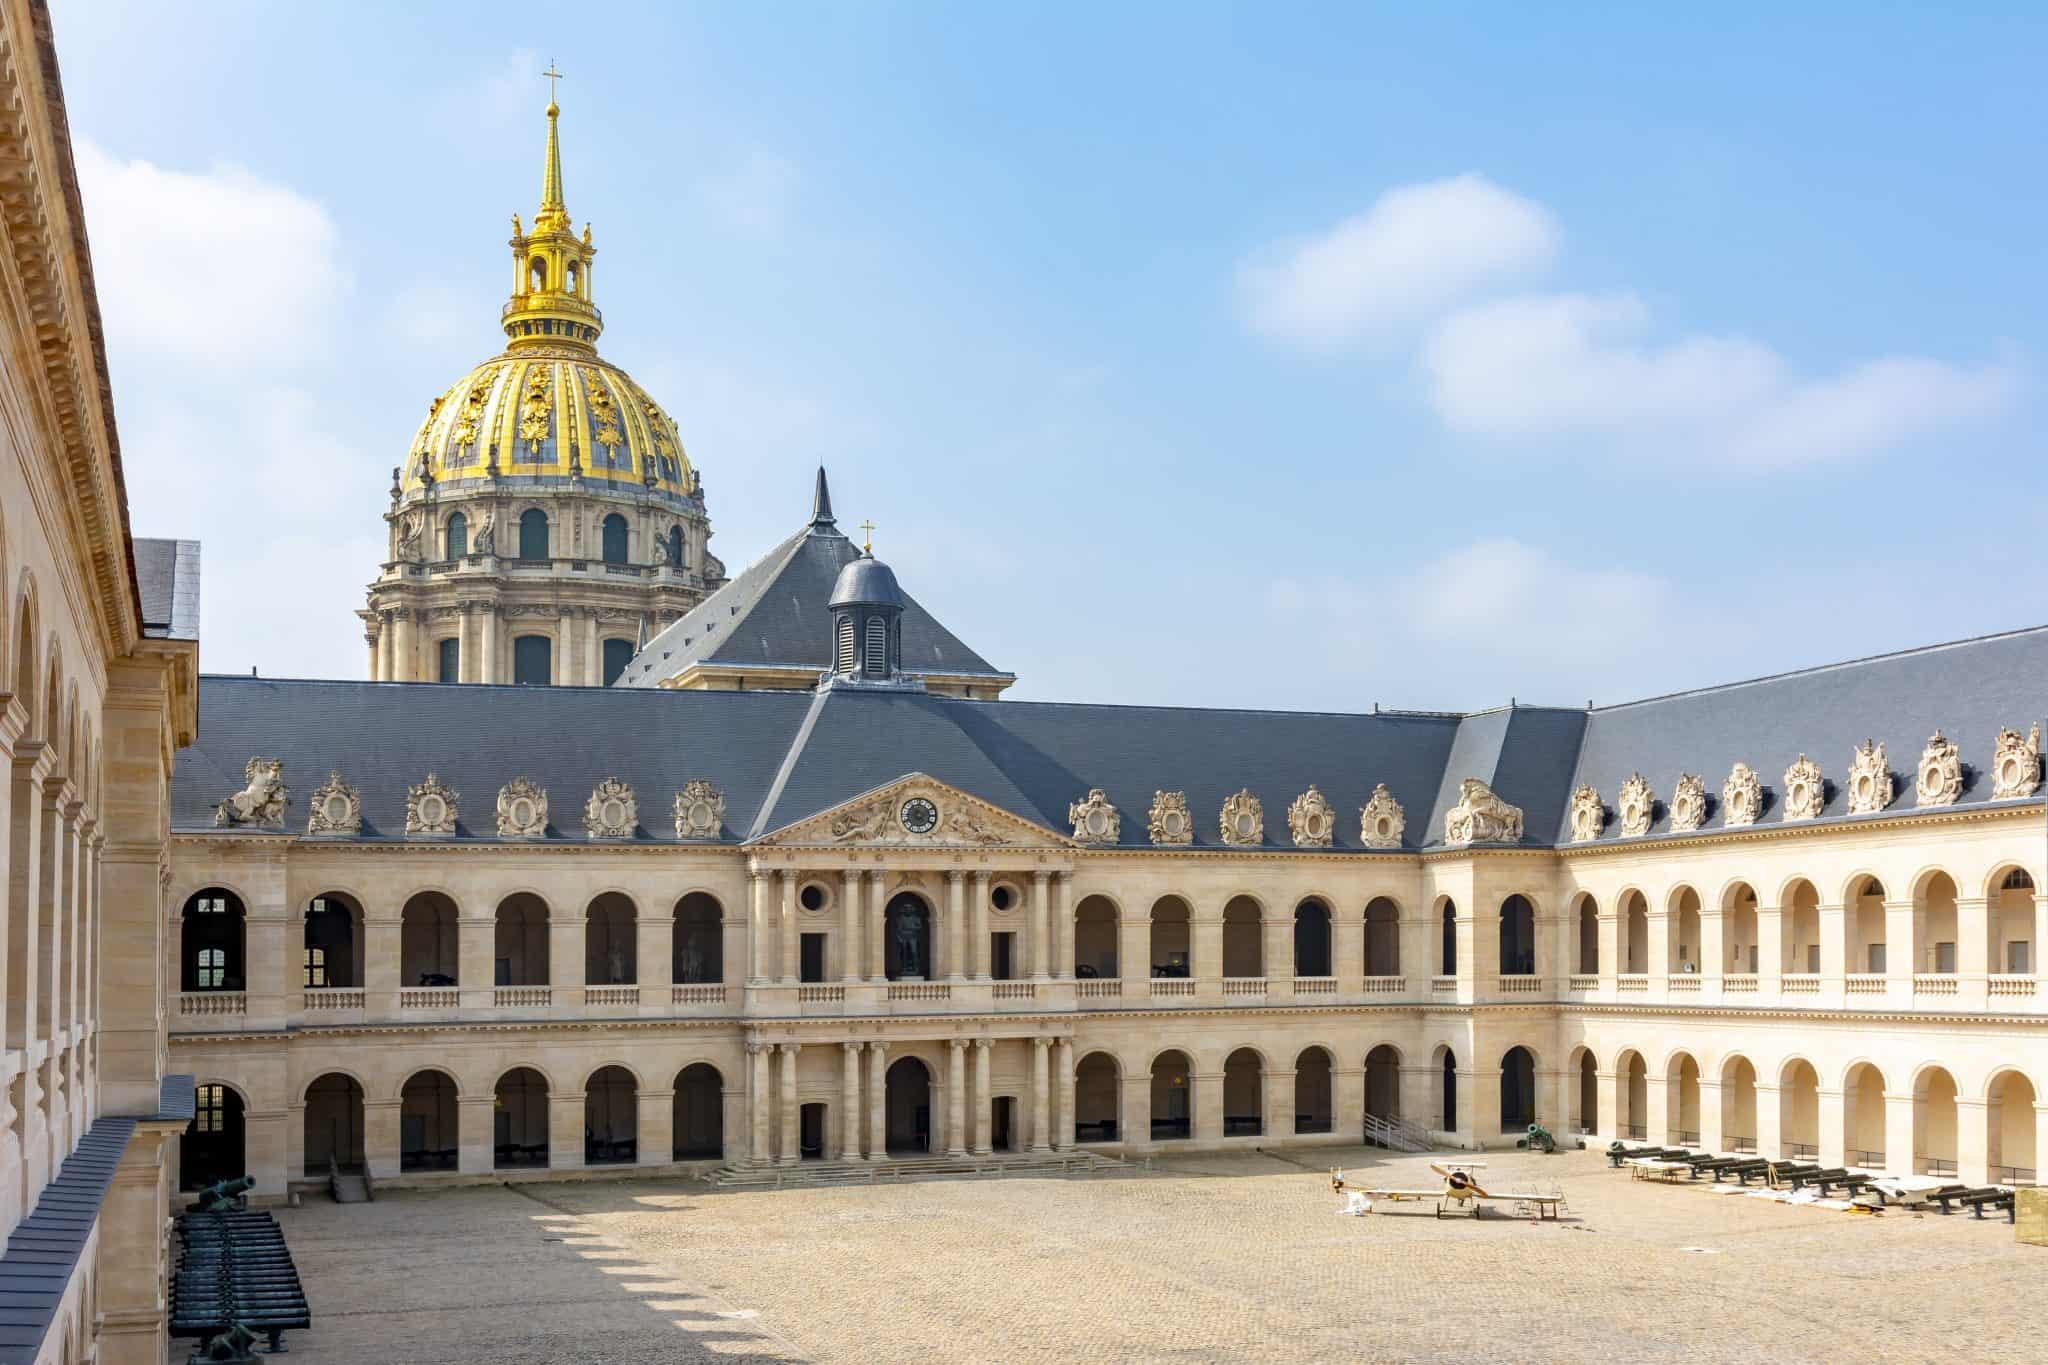 Les Invalides in Paris - visit Paris 4 days